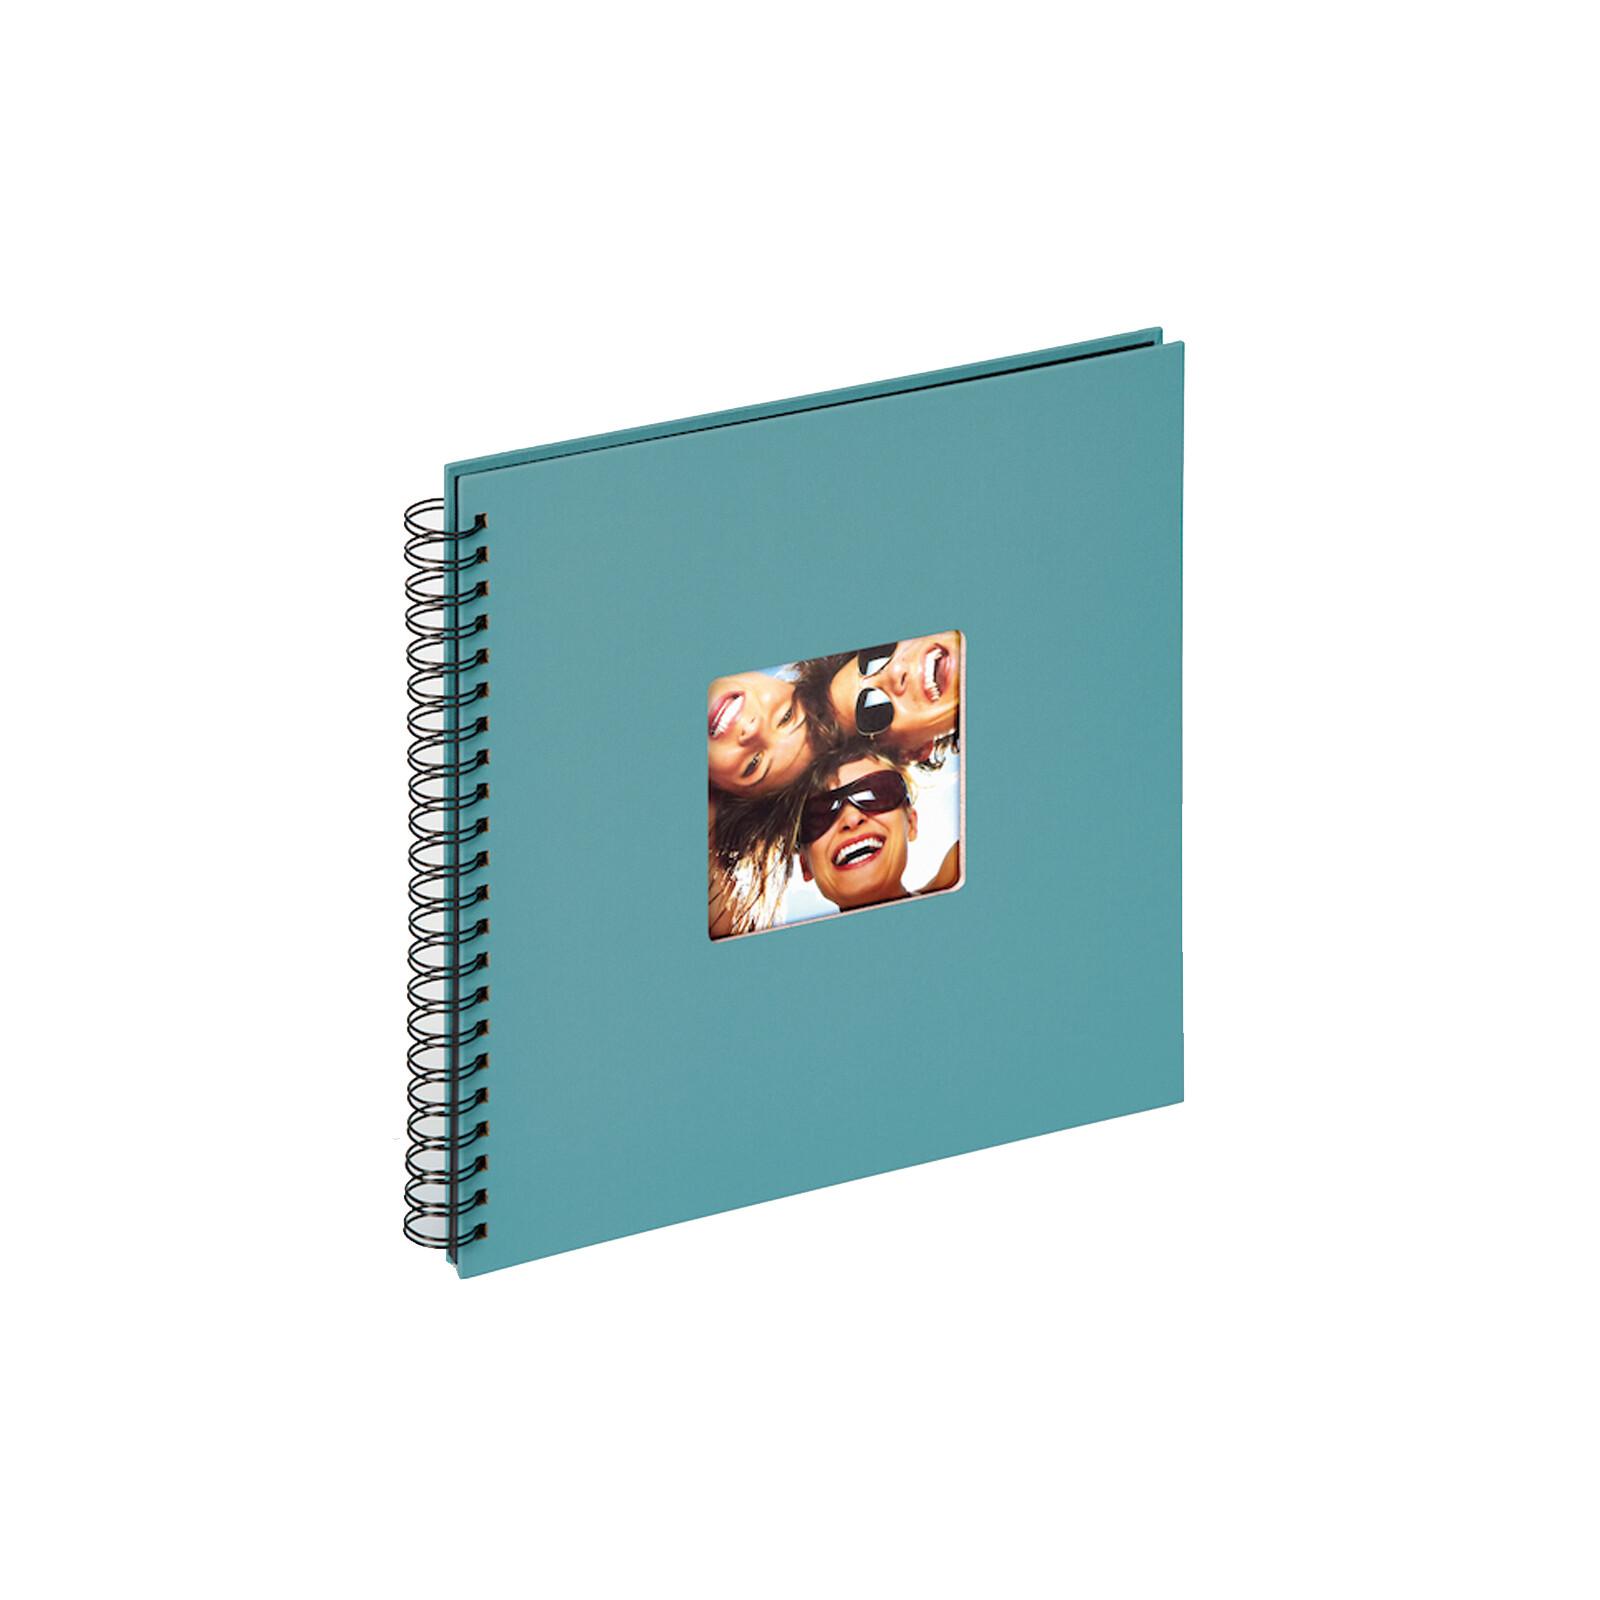 Album SA-110 30x30 50S Fun Petrol